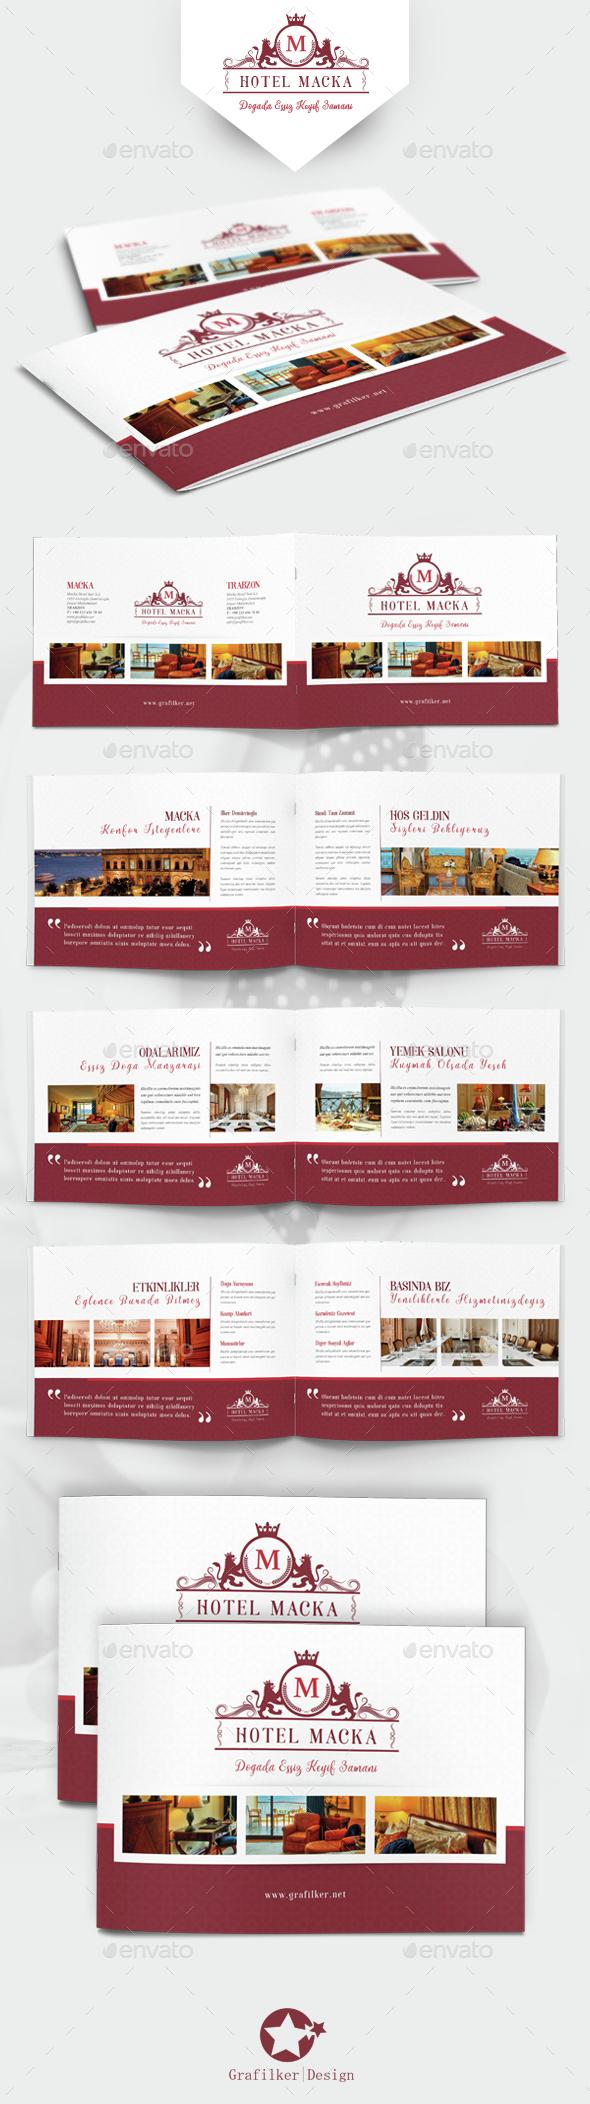 Hotel Brochure Templates by grafilker | GraphicRiver